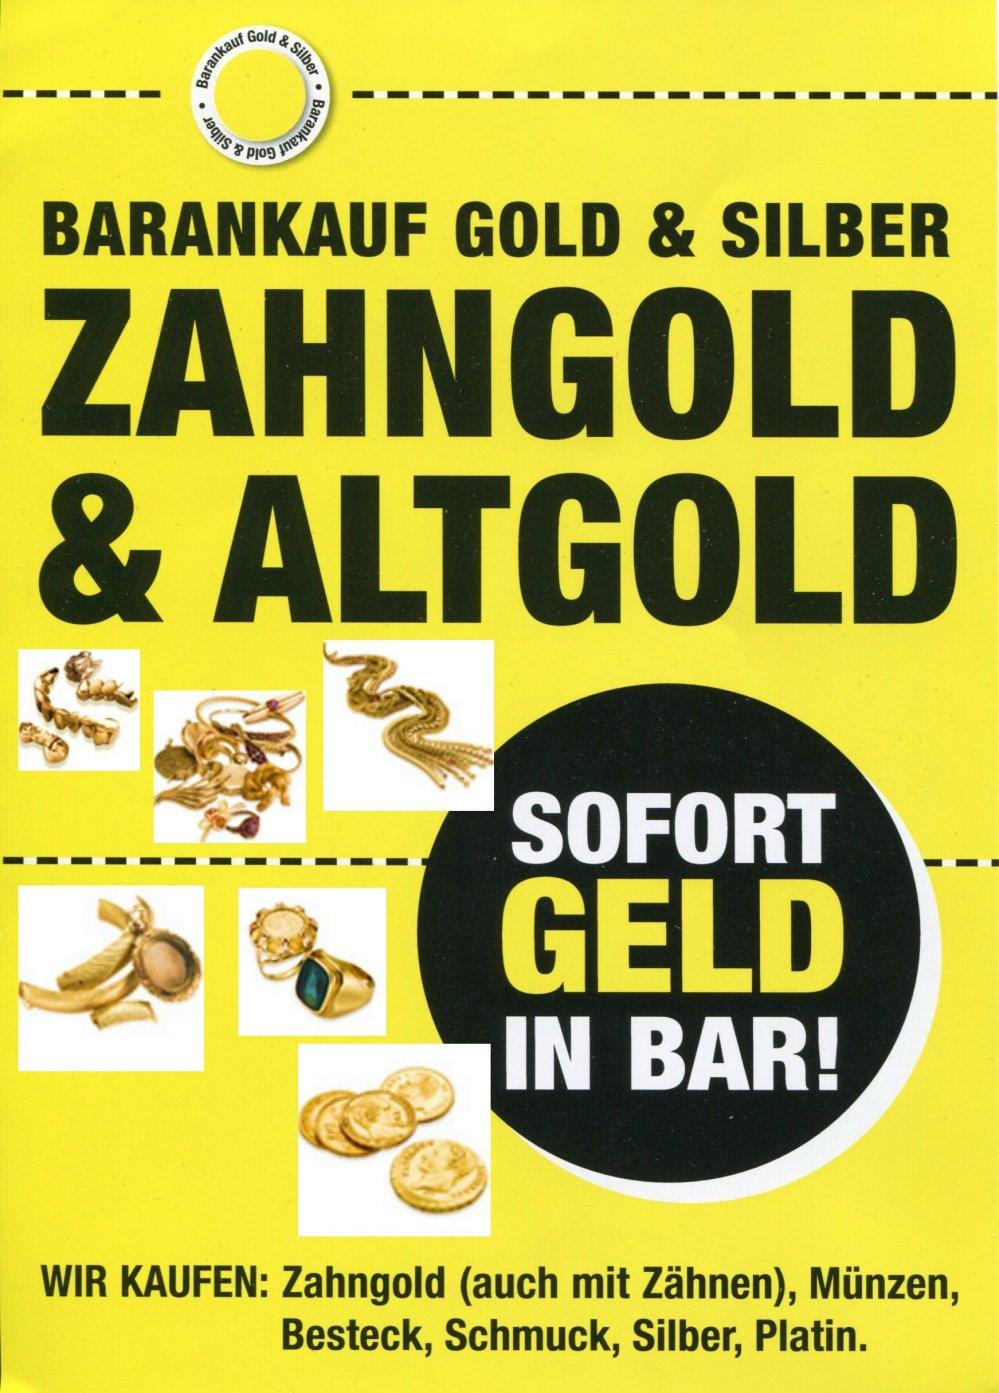 GA Plakat Altgold